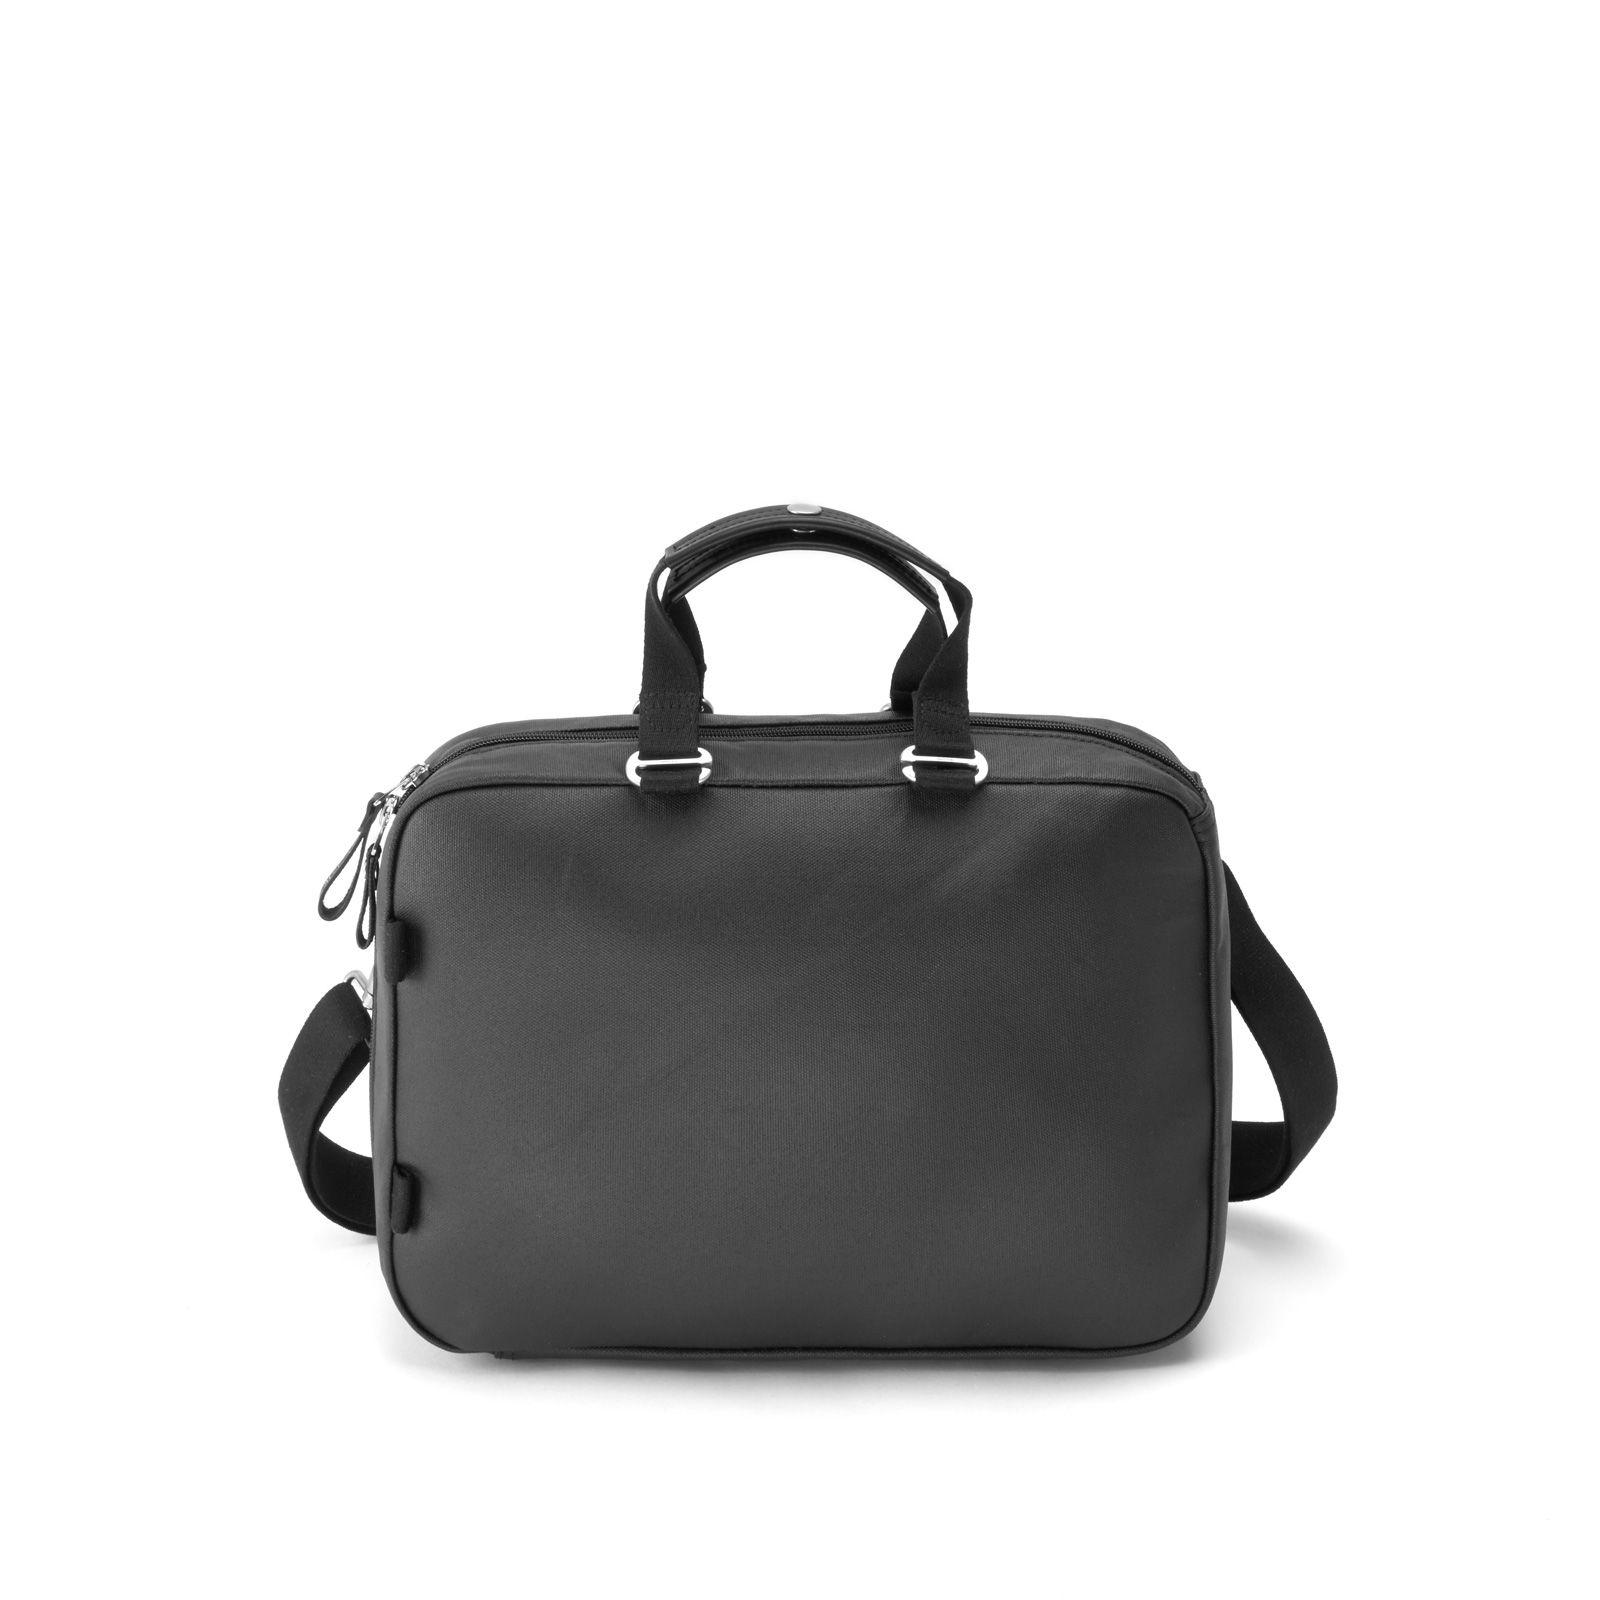 Office Pack - Organic Jet Black